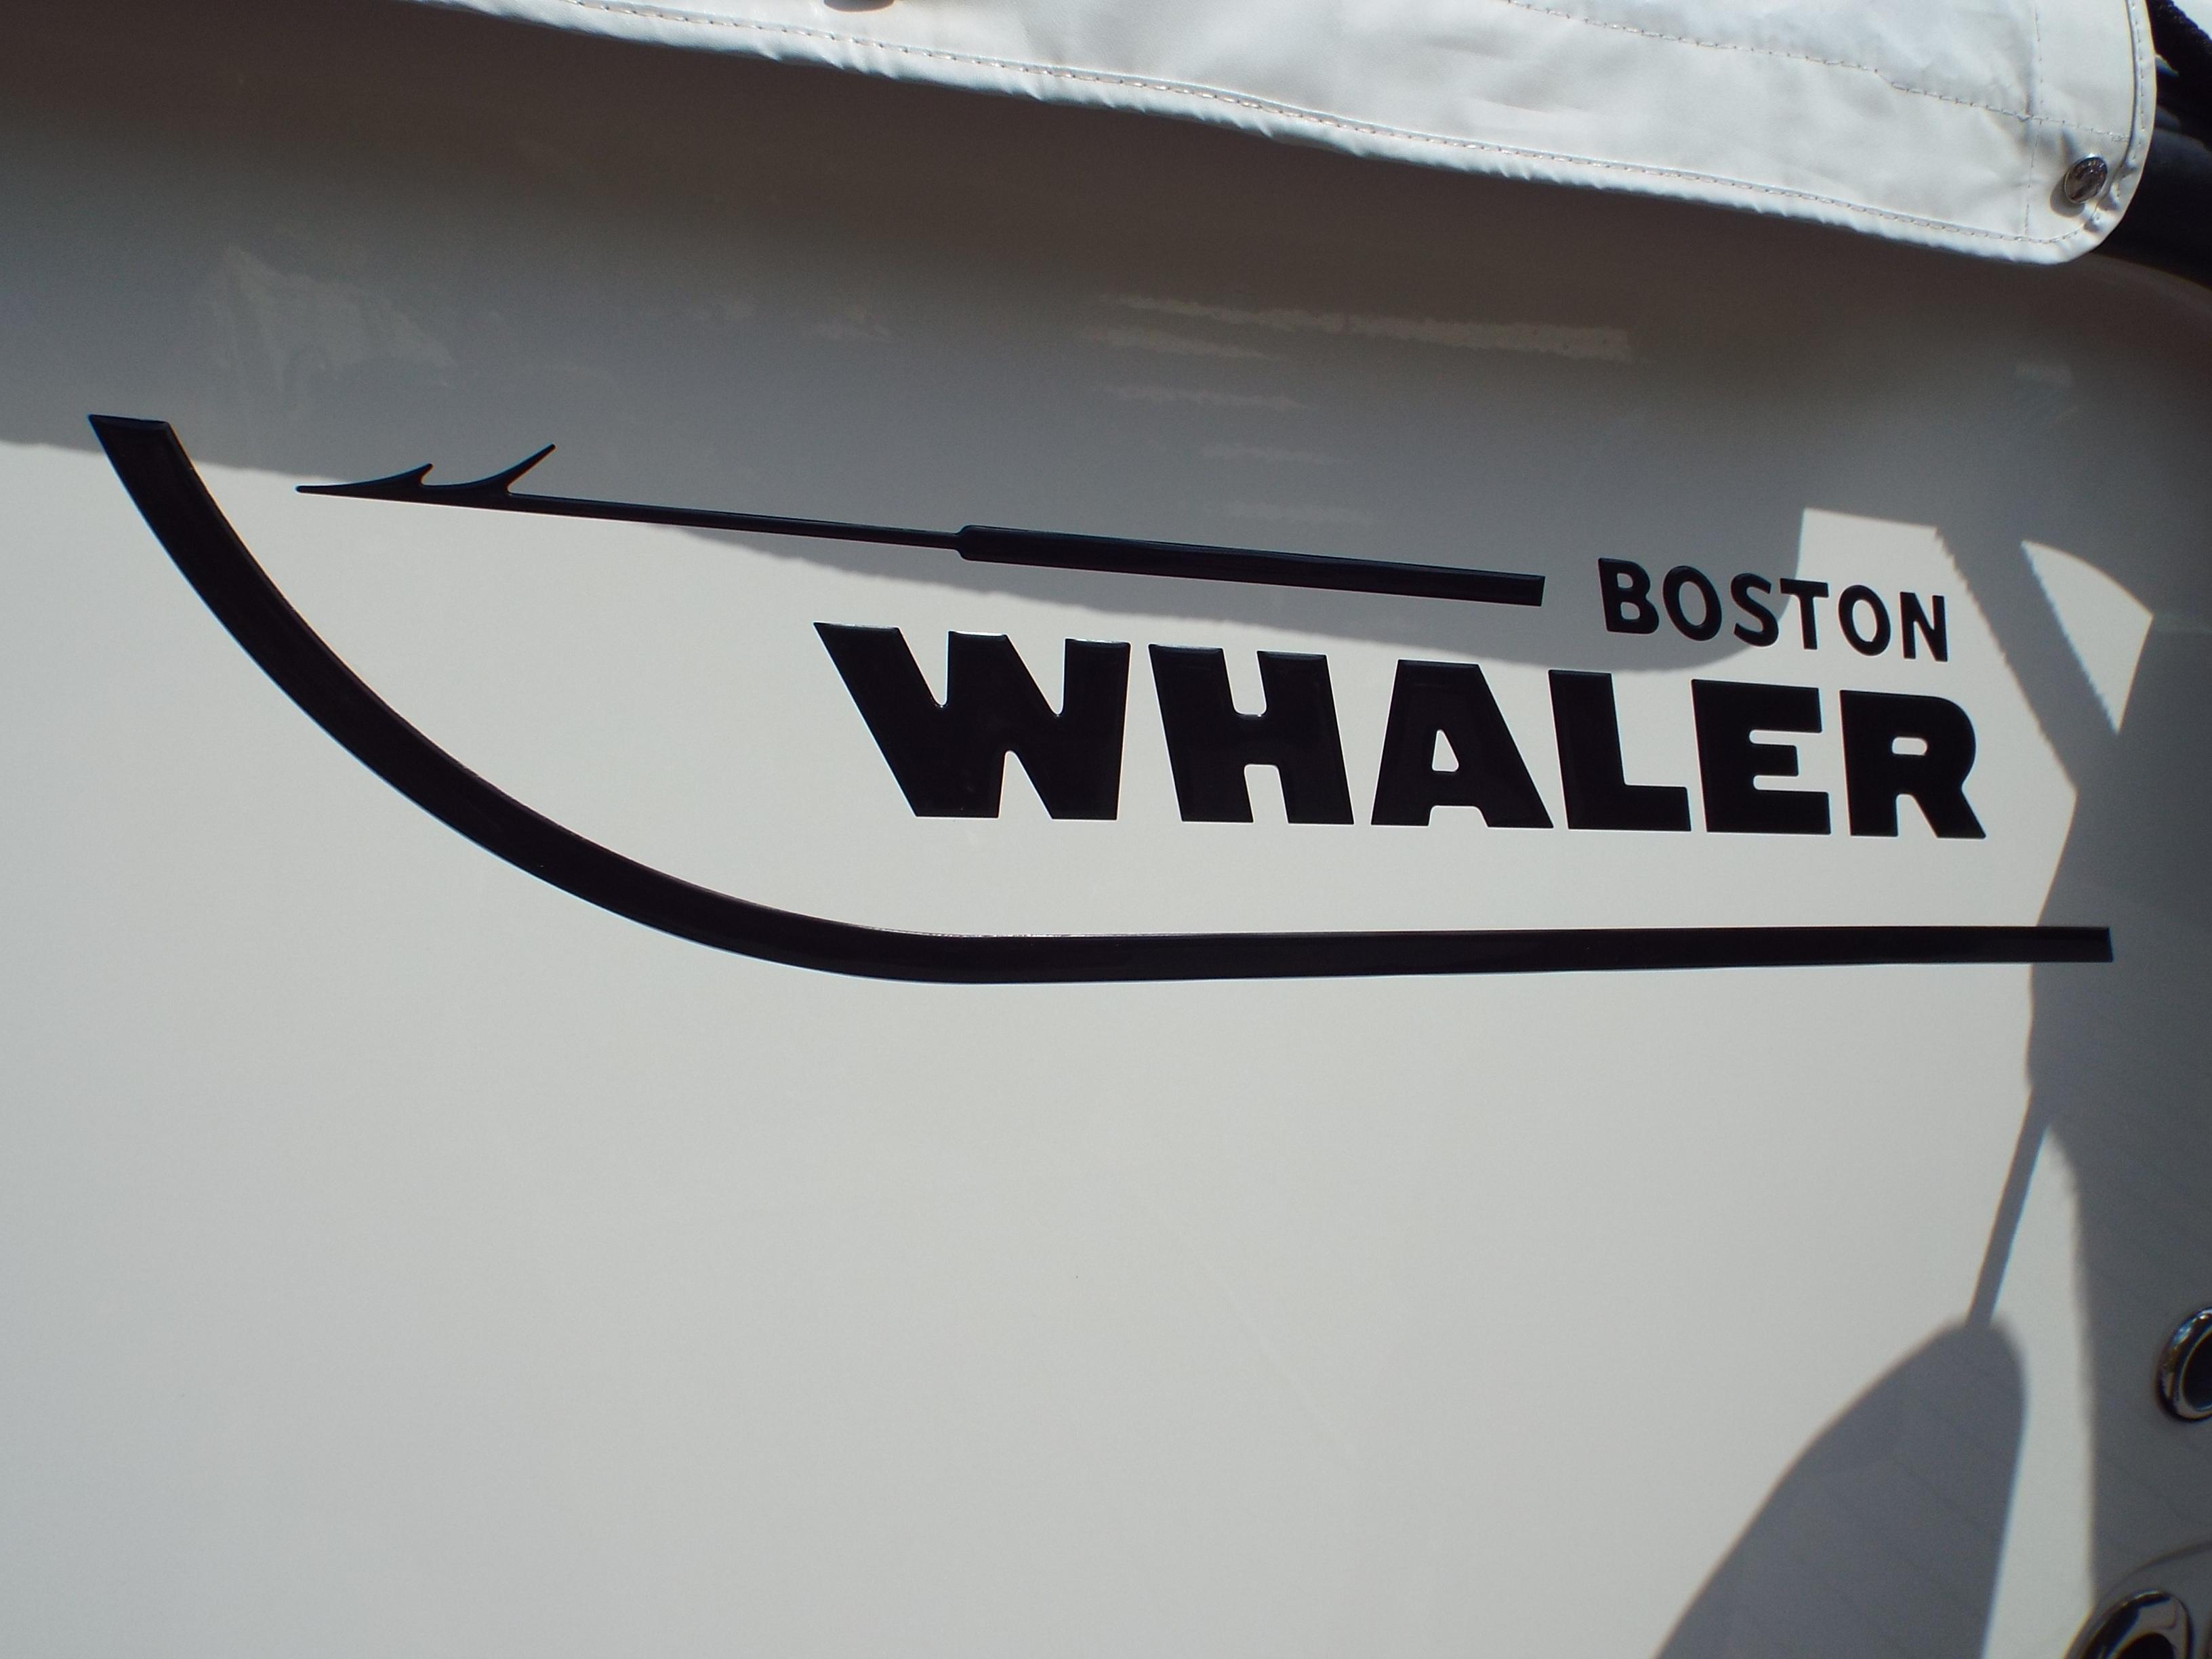 Boston Whaler Emblem